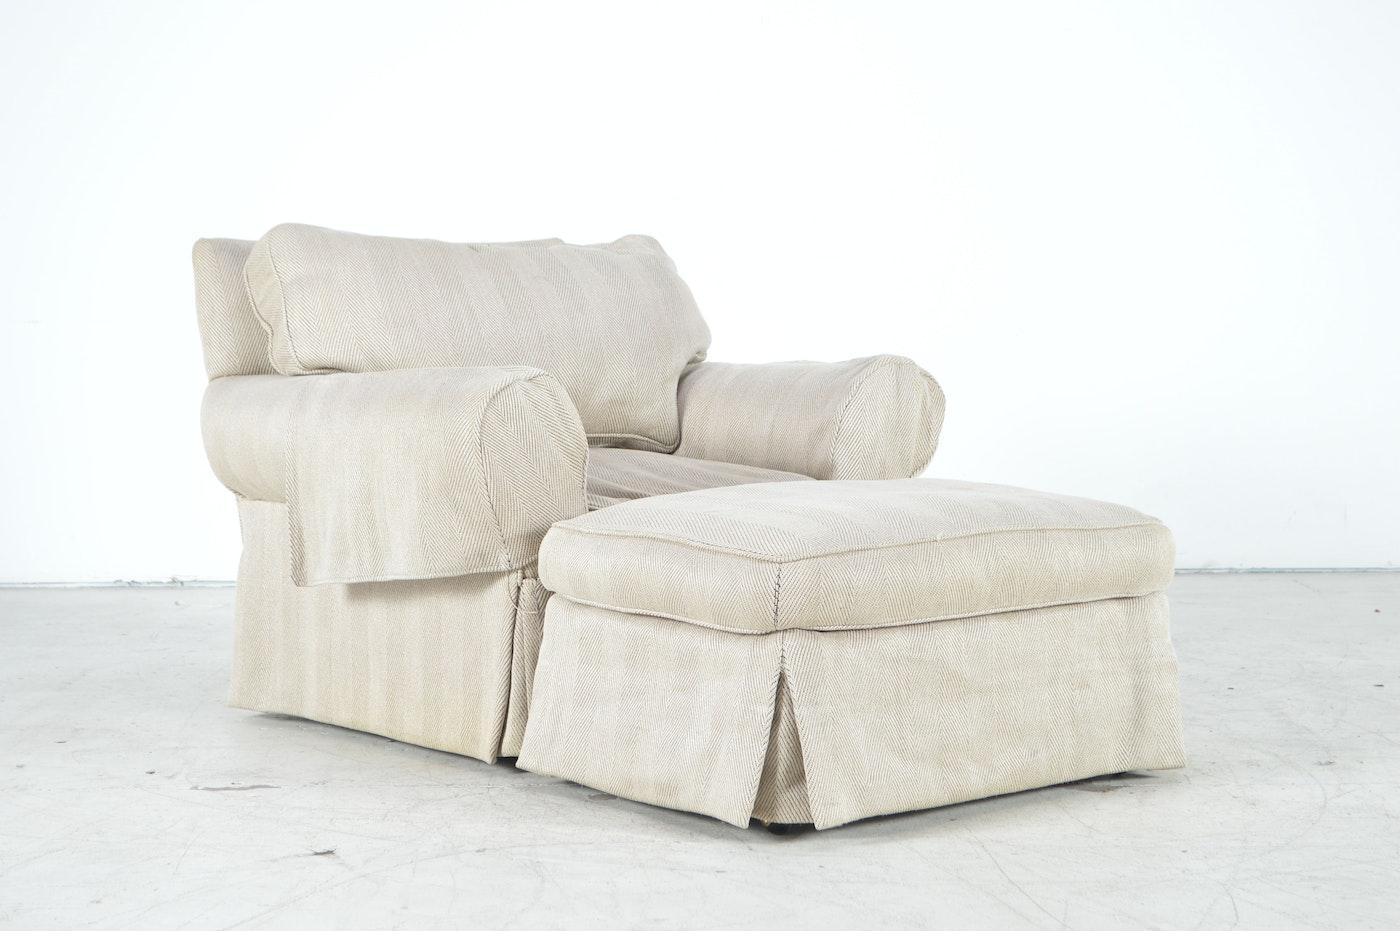 Overstuffed armchair and ottoman ebth for Overstuffed armchair